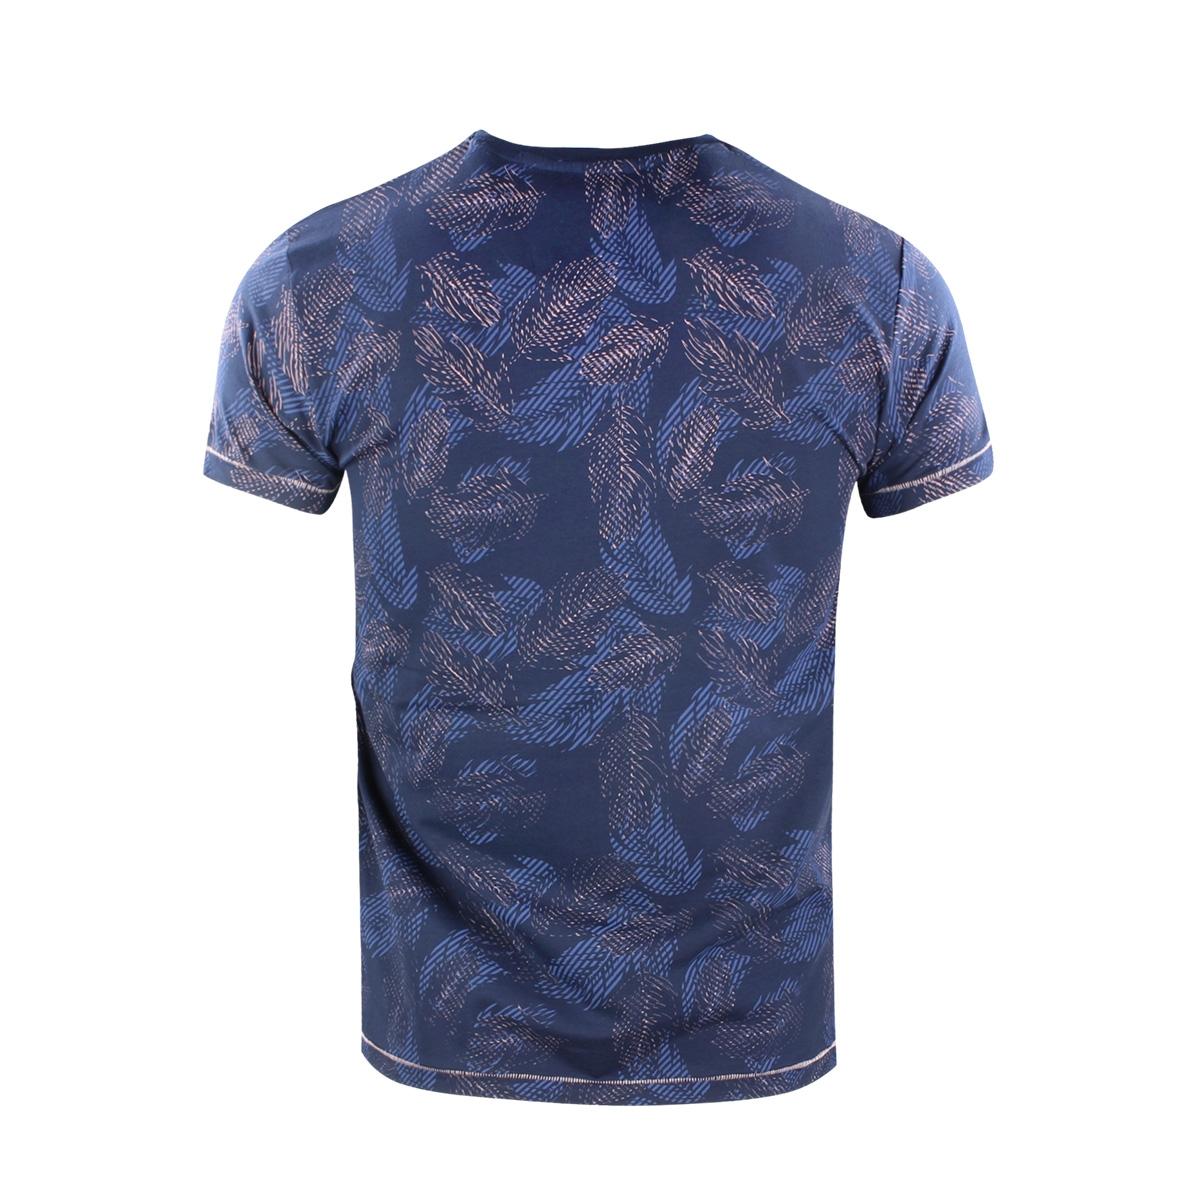 t shirt 15175 gabbiano t-shirt navy